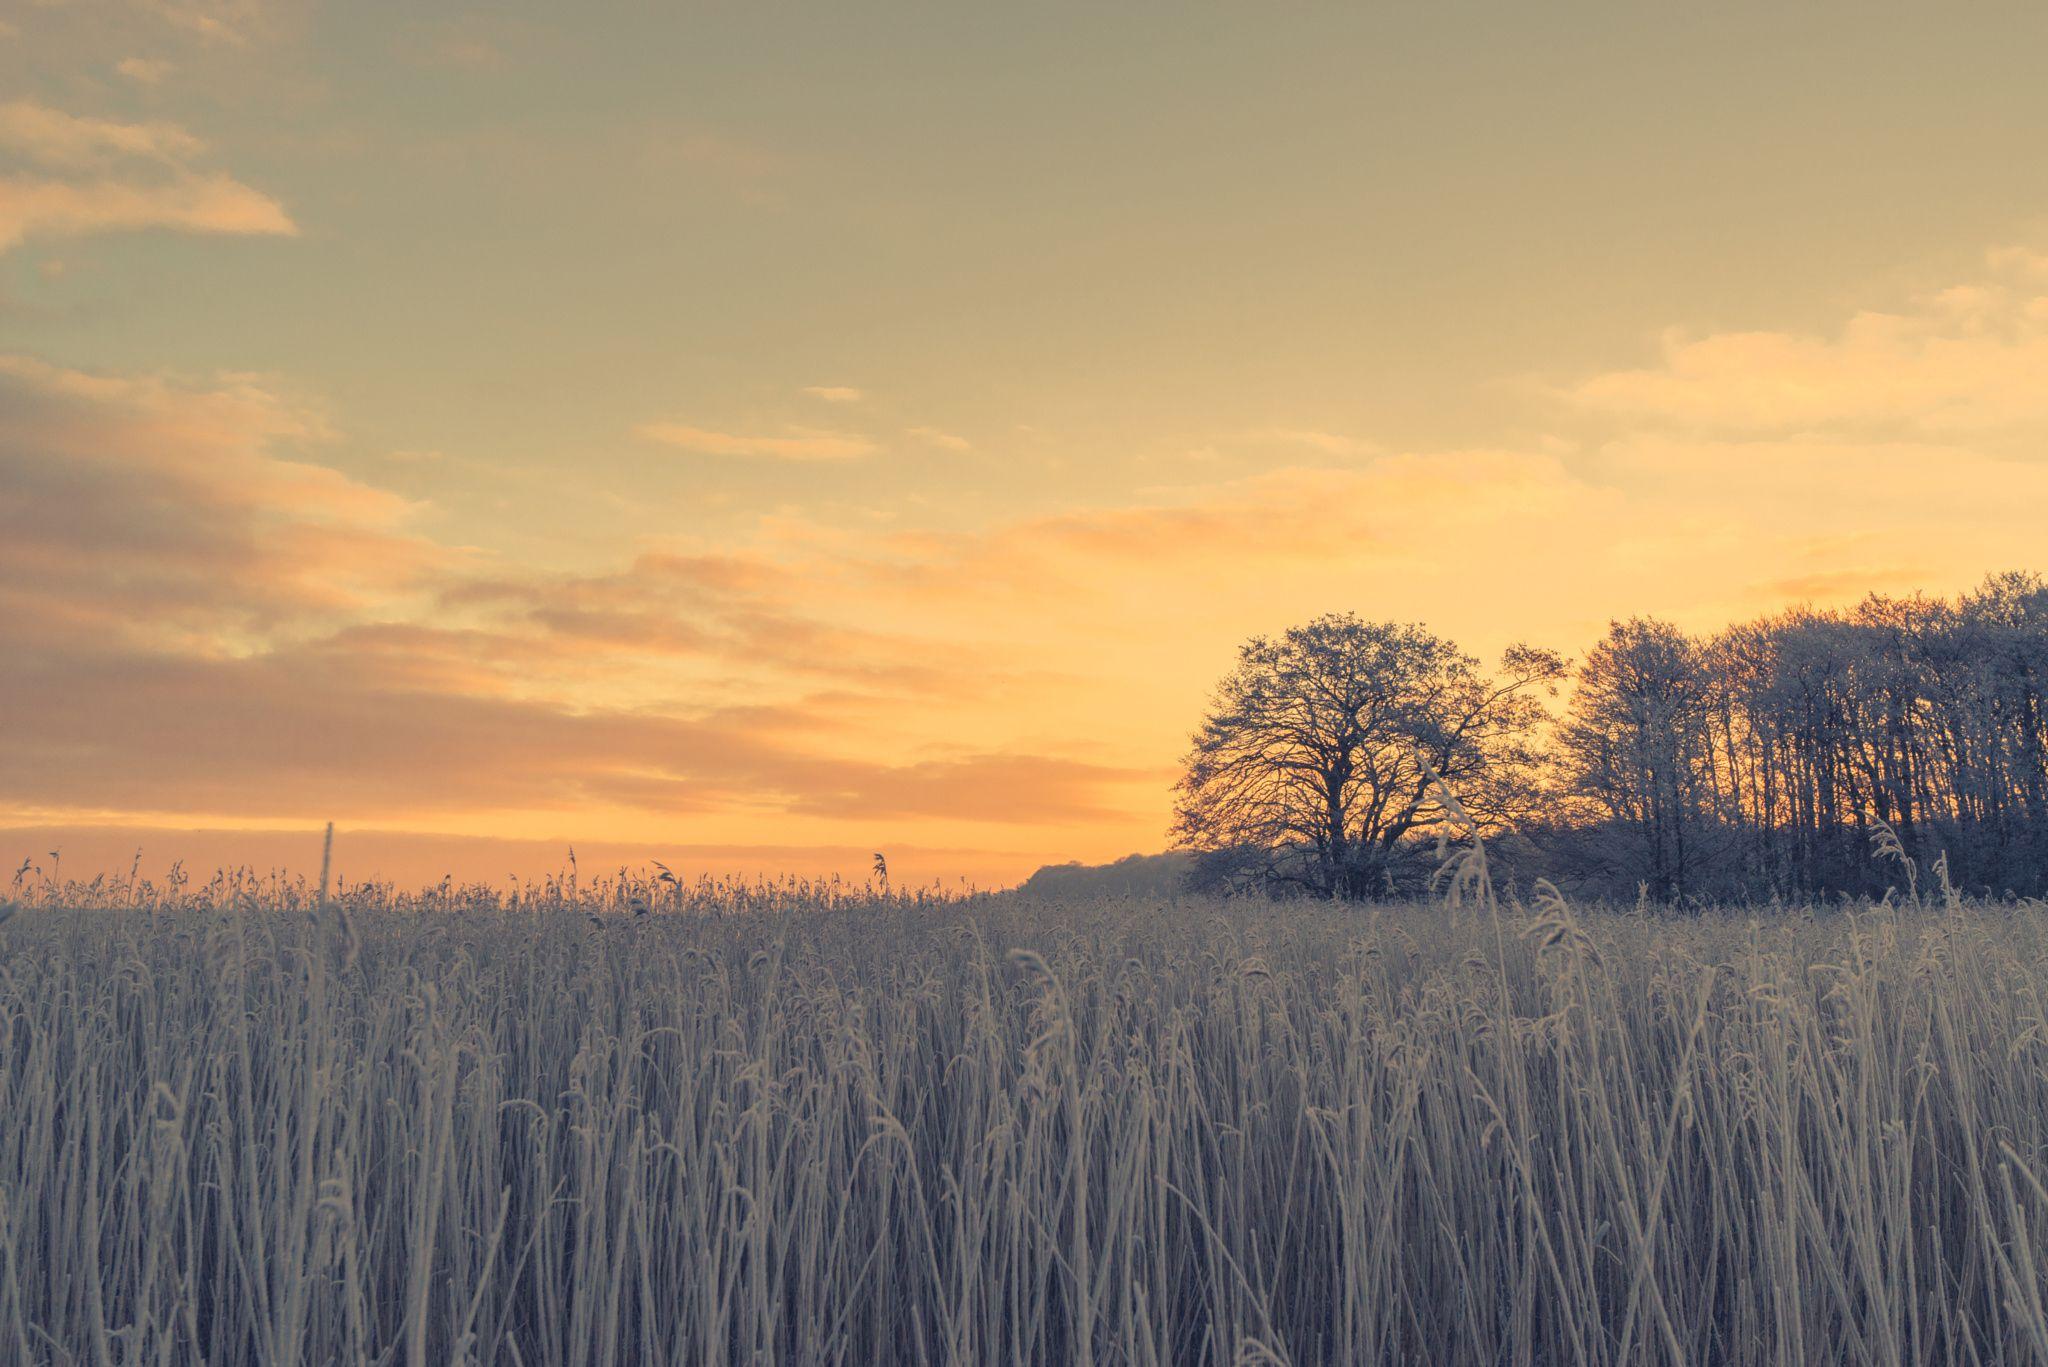 Countryside sunrise with a frosty field by Kasper Nymann on 500px